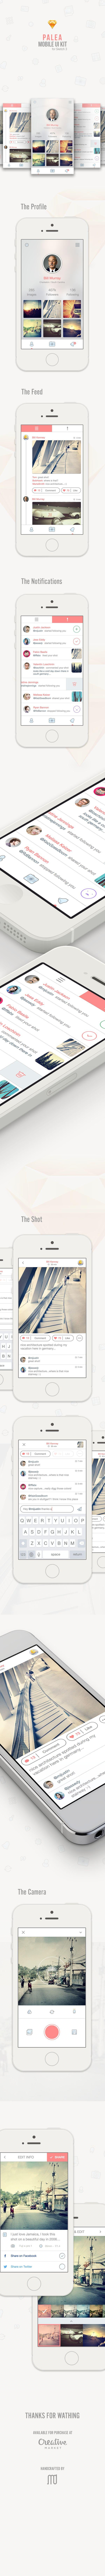 Palea Mobile UI Kit for Sketch